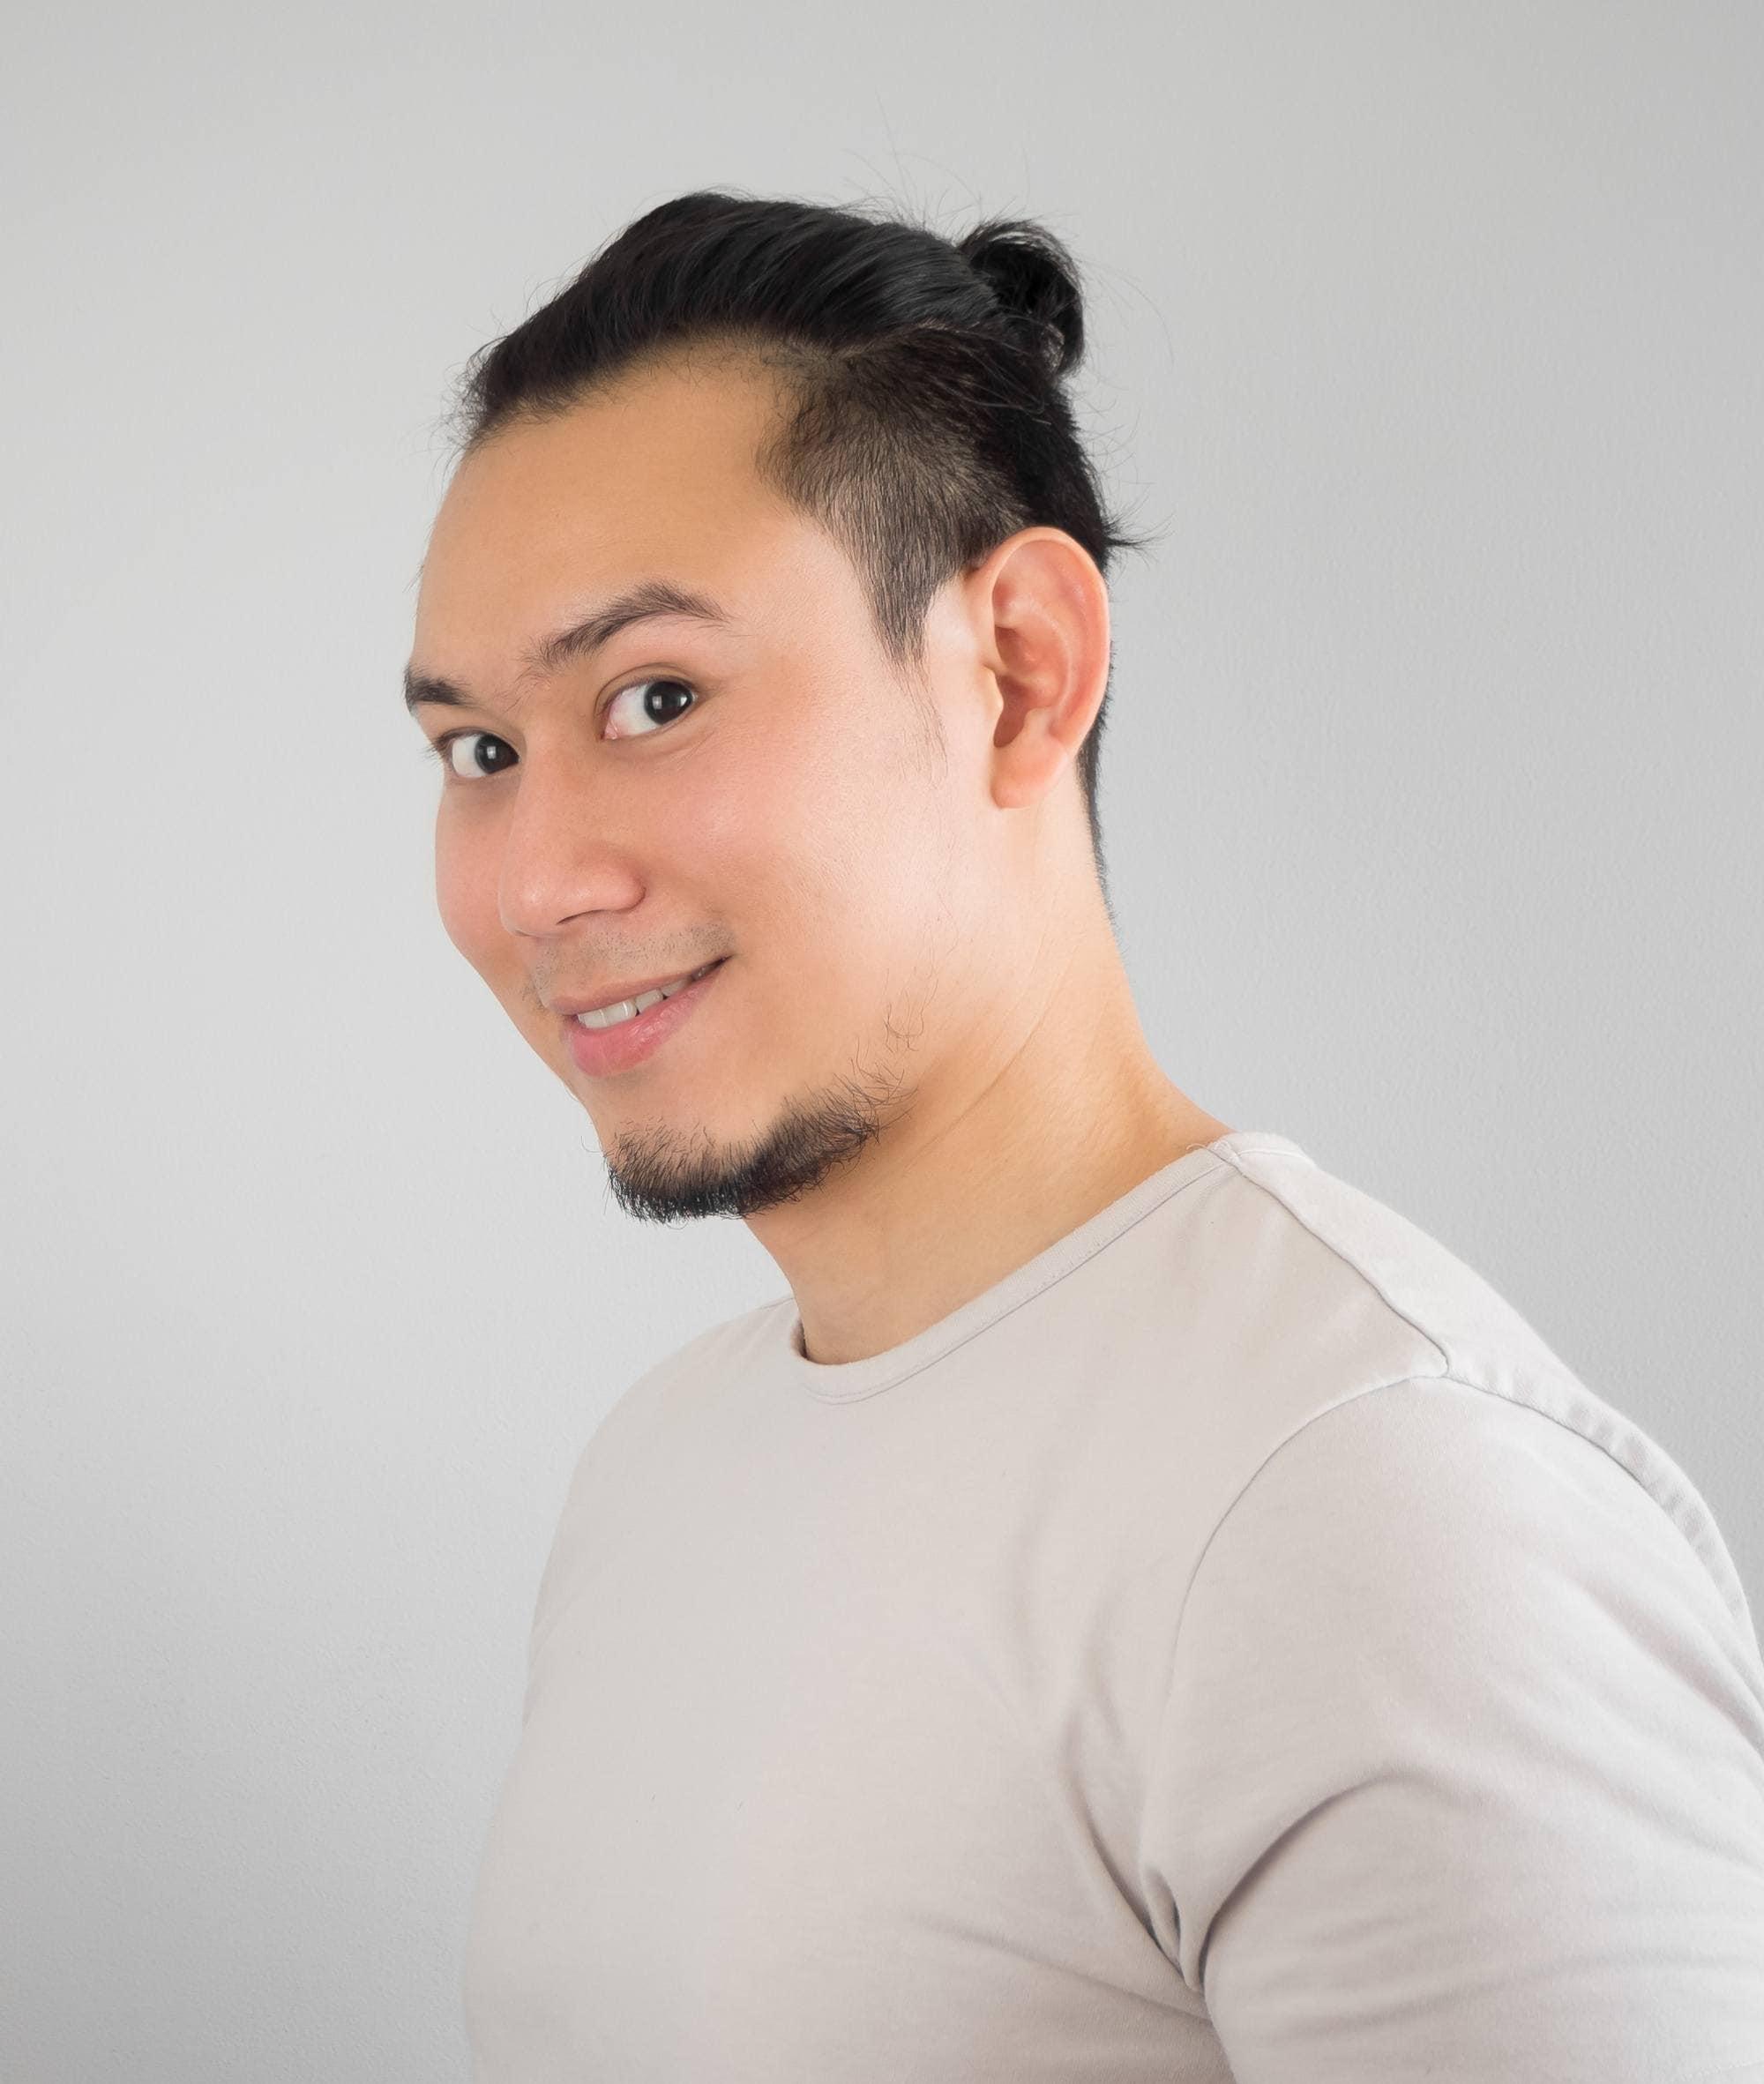 Asian man bun: Asian man smiling with black hair in a mini bun wearing a gray shirt